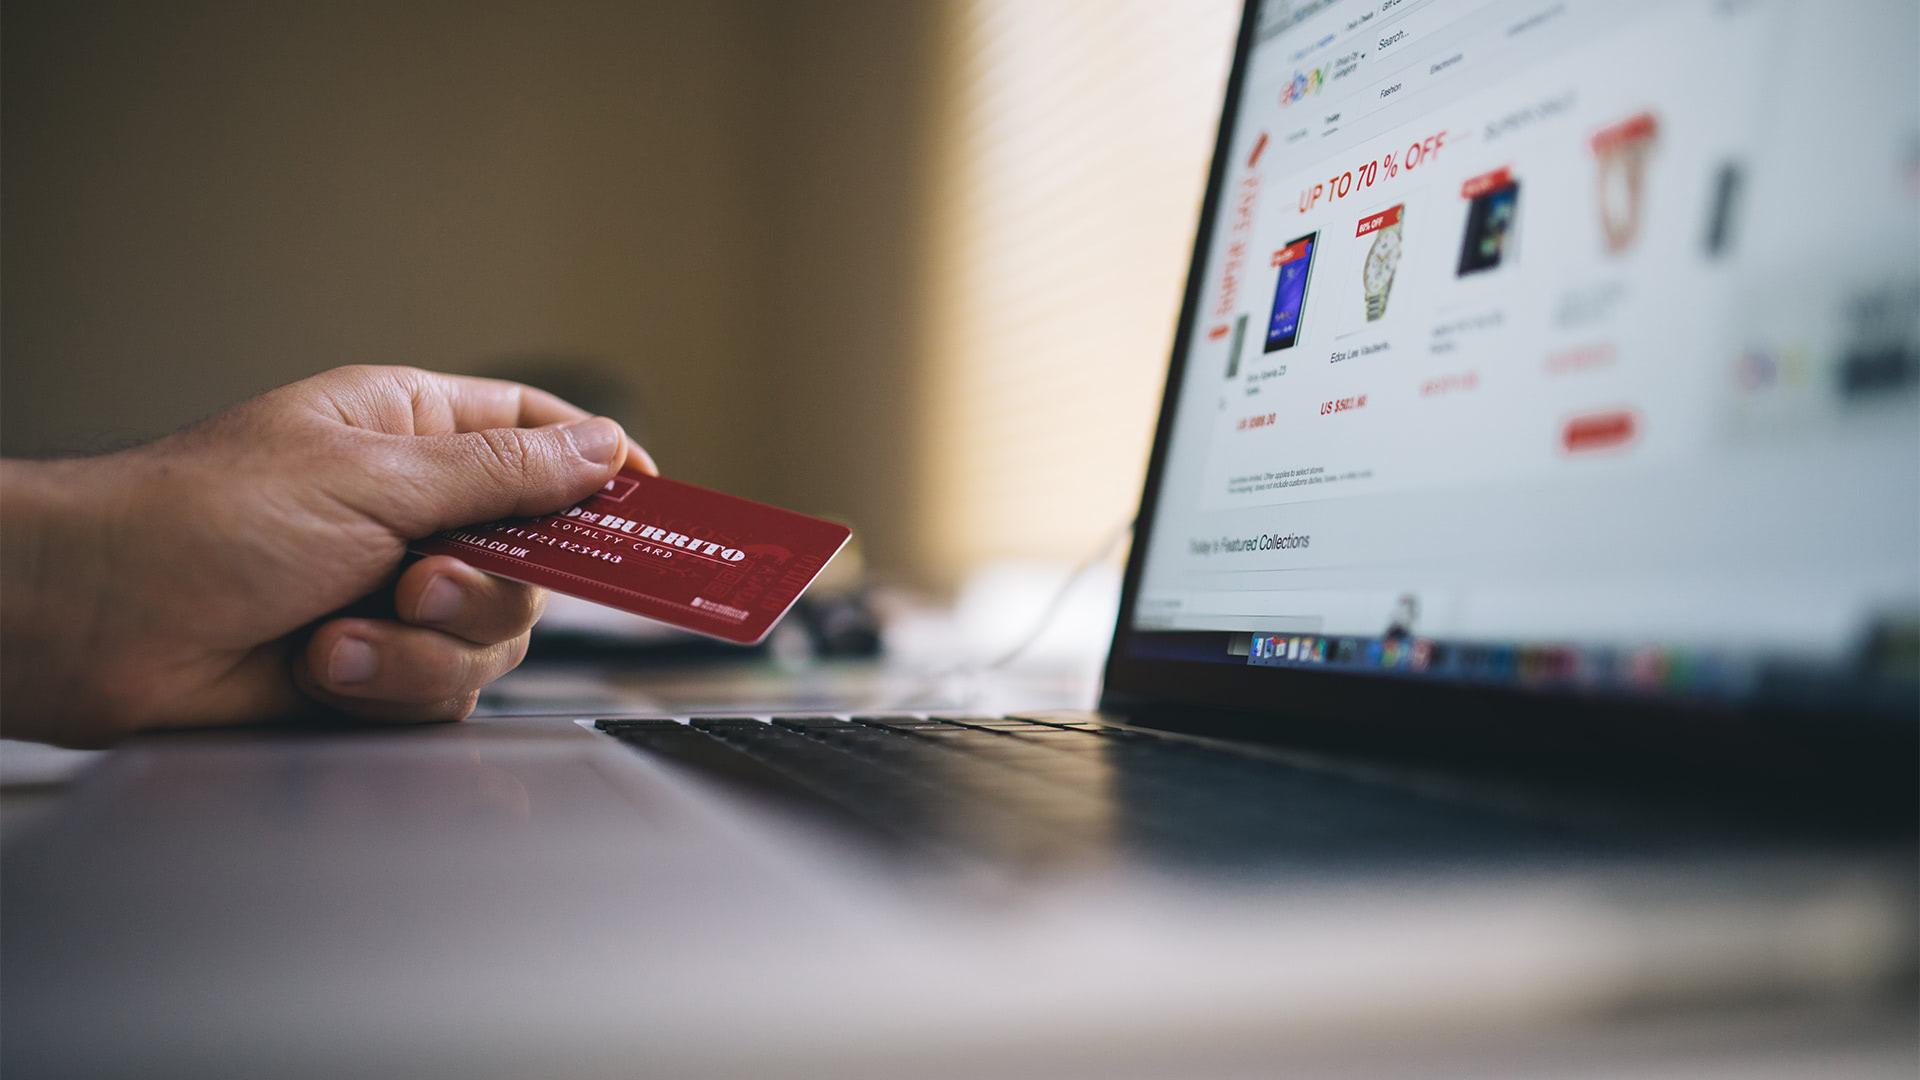 Shopify Versus WooCommerece: A Detailed Comparison